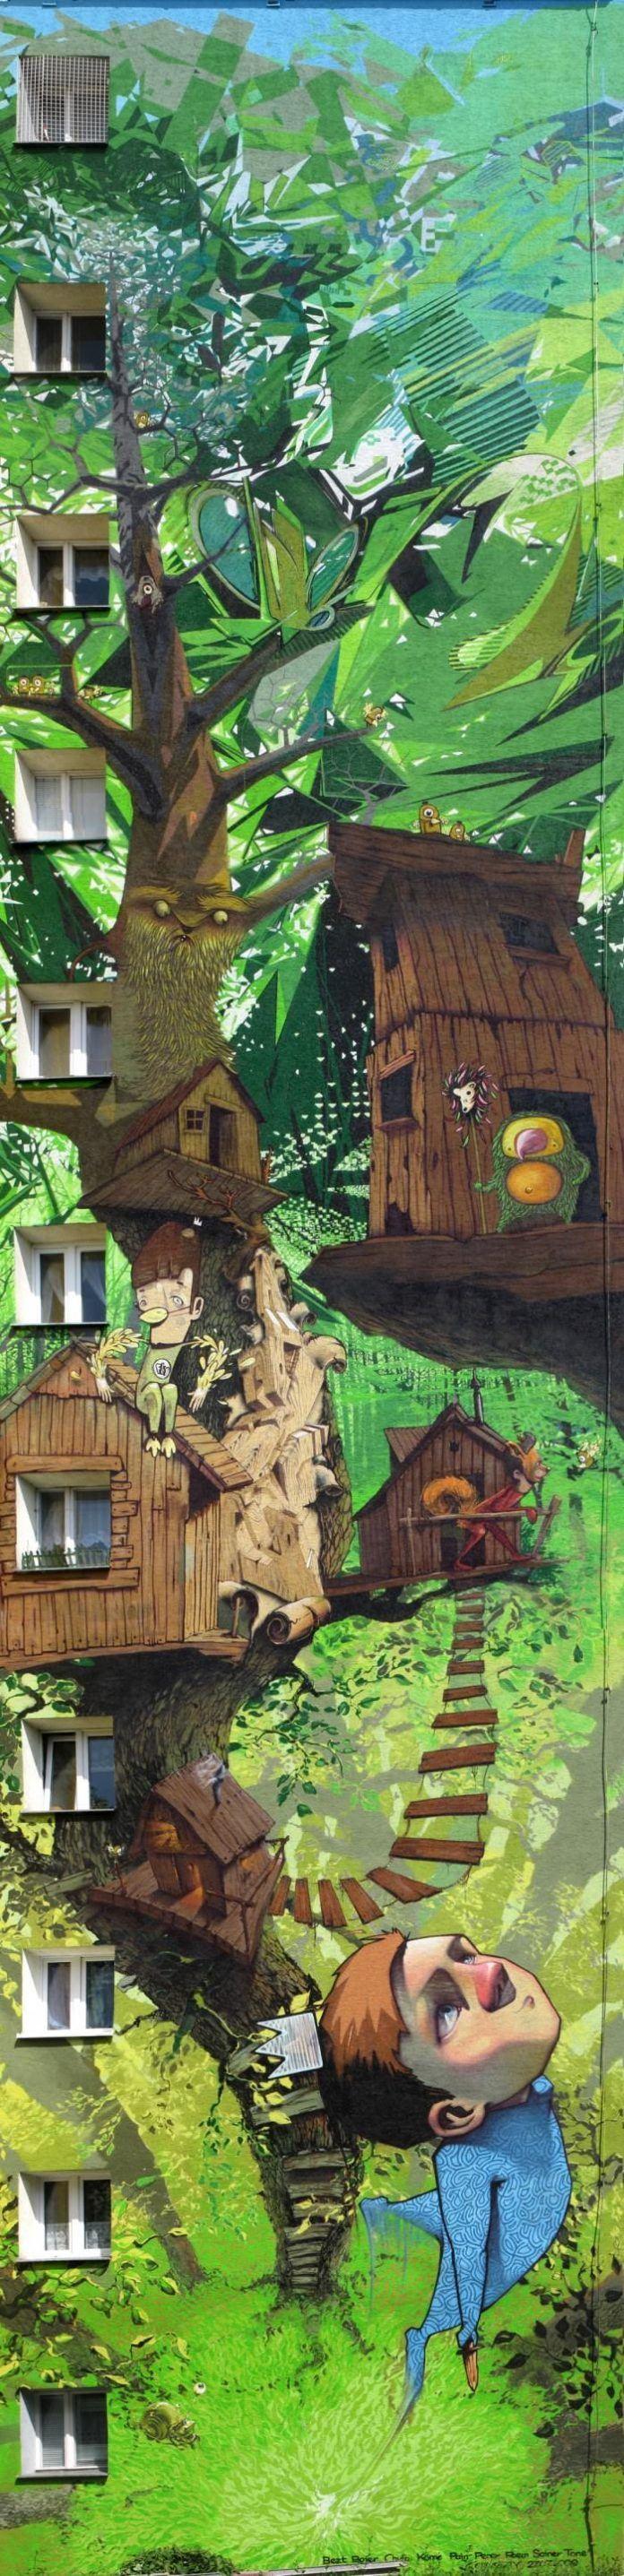 awesome graffiti cool street art fantasy tree house imagination garden dream boy clever